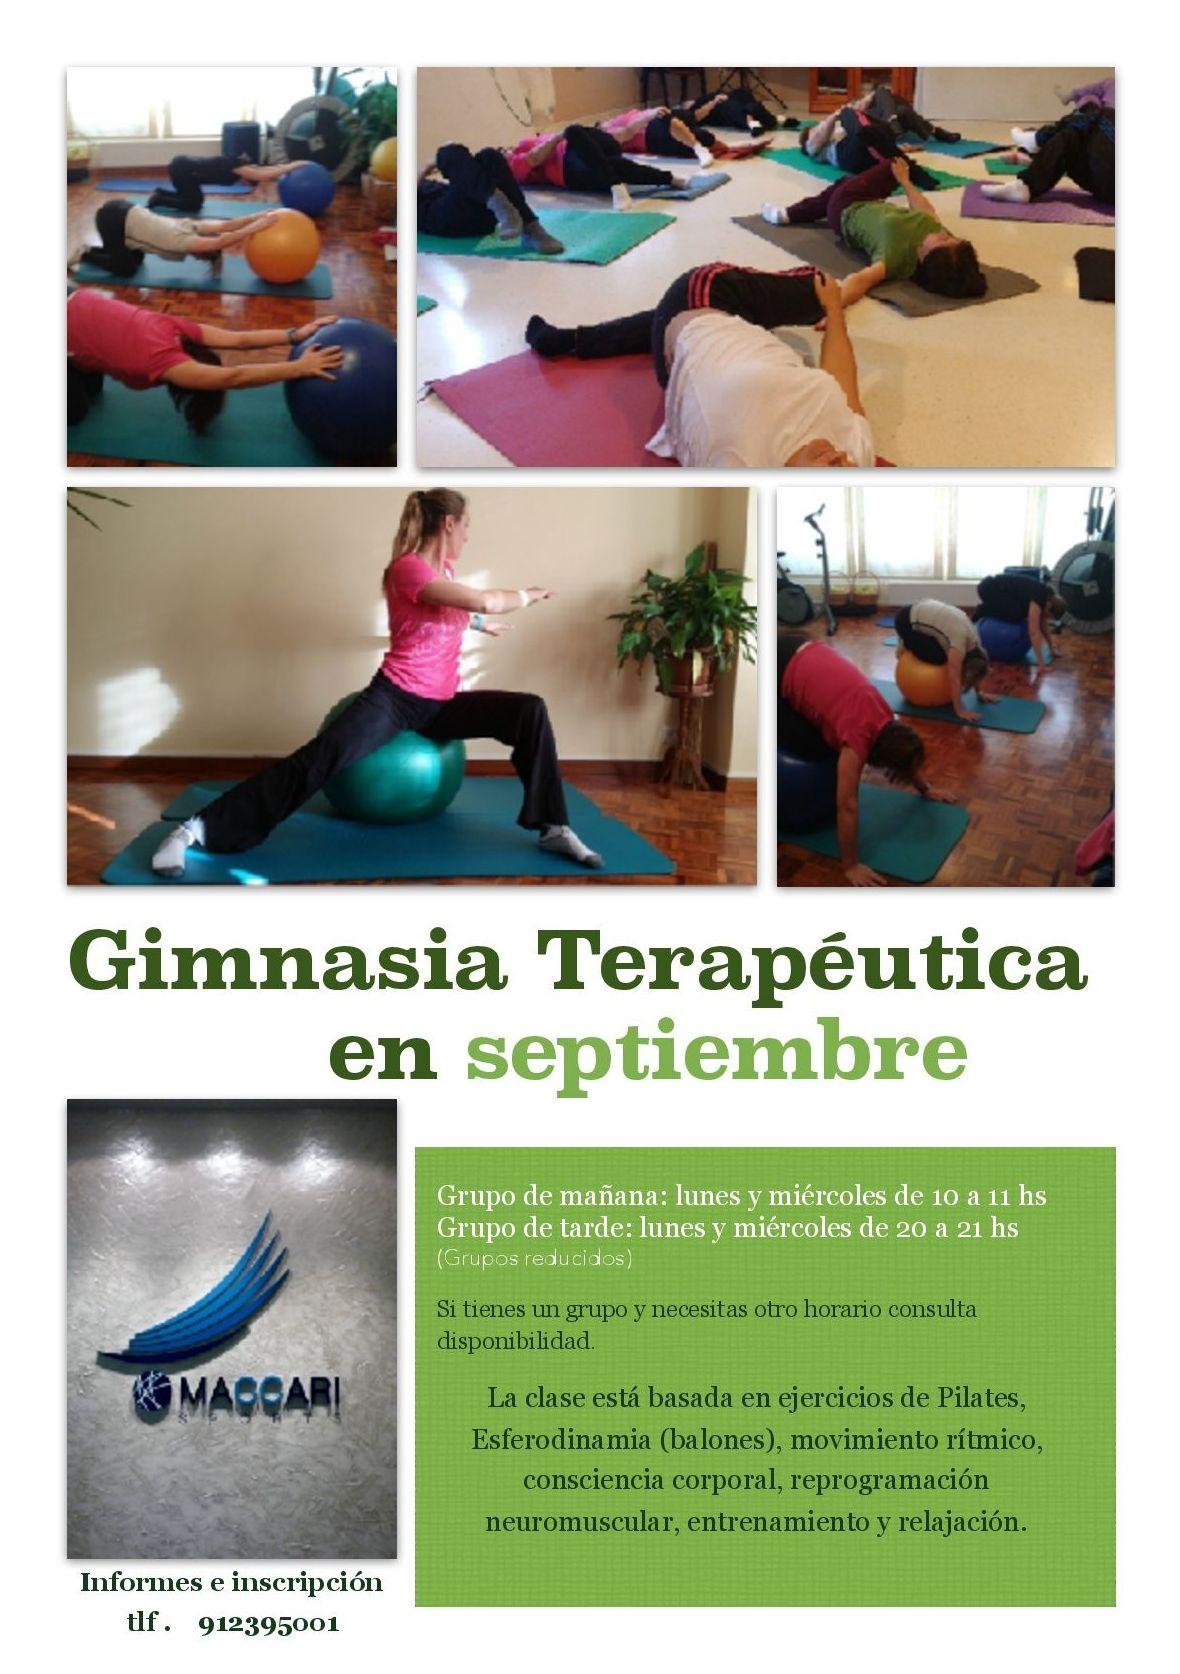 Foto 13 de Fisioterapia en Fuenlabrada | Clínica Fisioterapia Maccari Sport